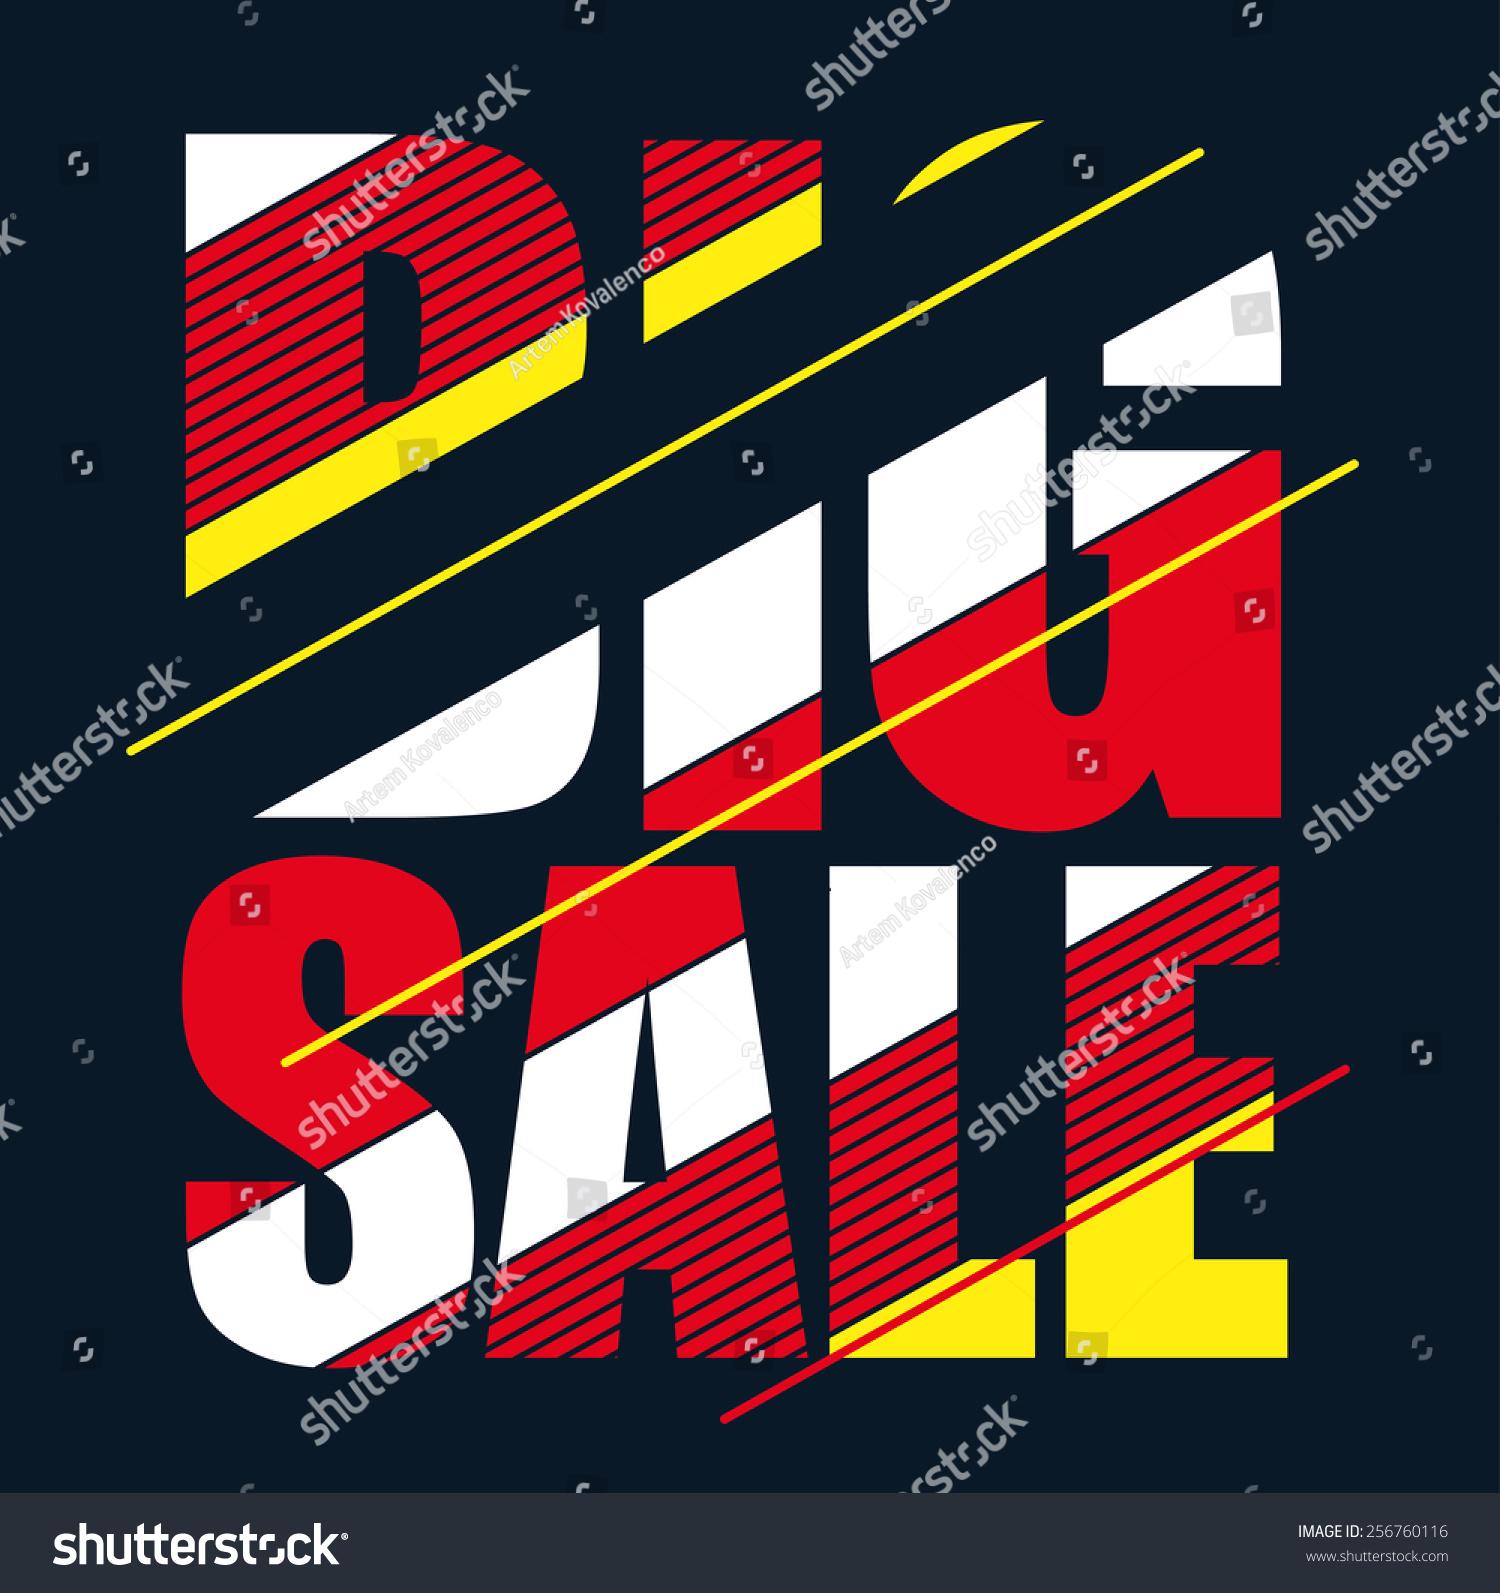 Vector illustration big sale graphics tshirt stock vector for T shirt graphics for sale